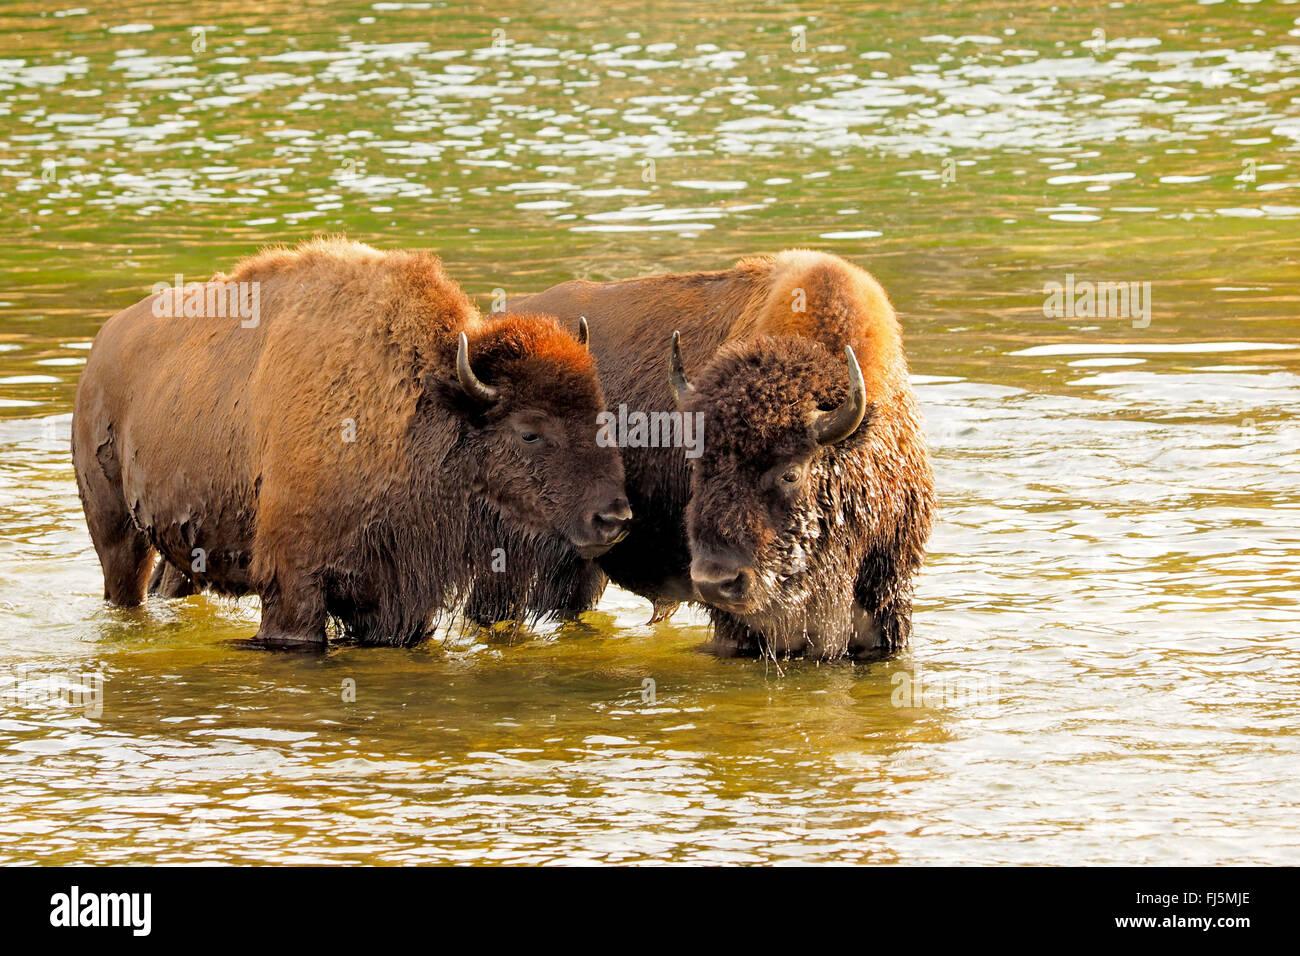 American bison, buffalo (Bison bison), buffalos crossing Yellowstone River, USA, Wyoming, Yellowstone National Park, - Stock Image